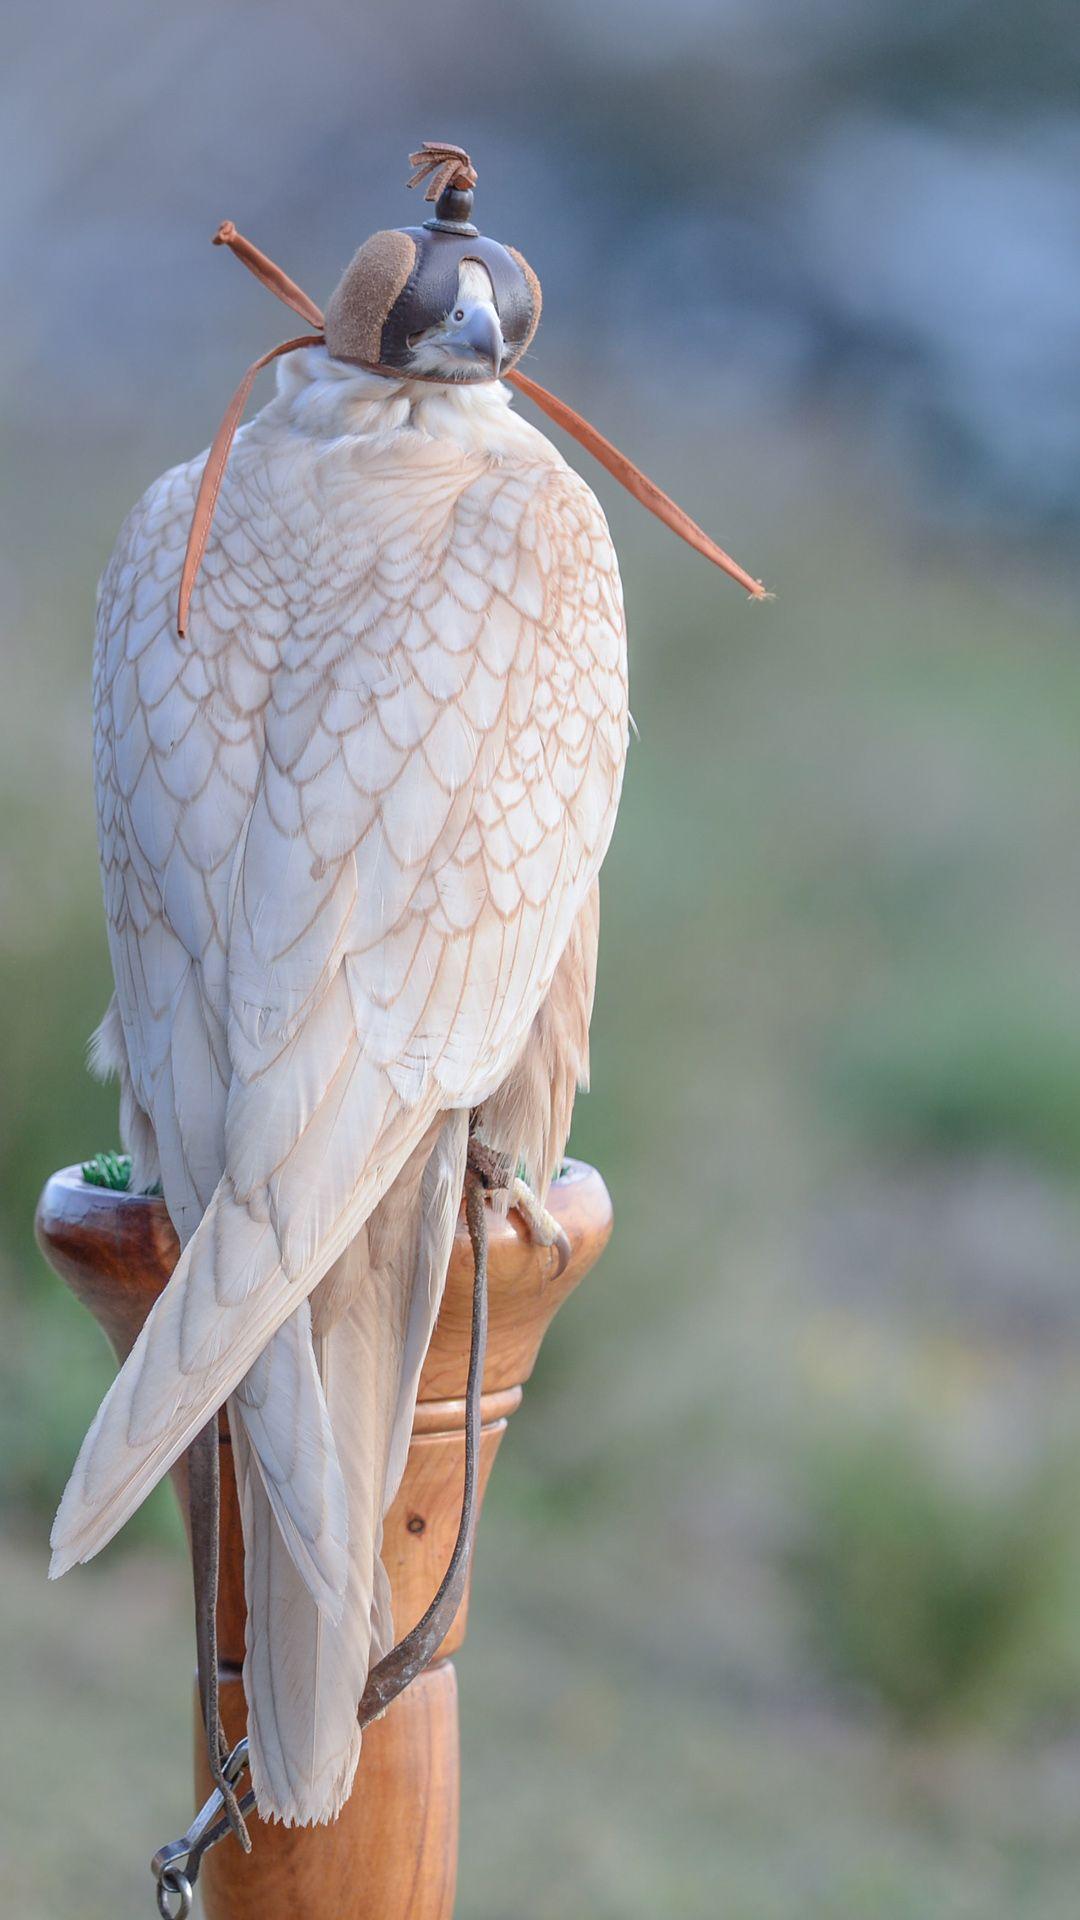 Pin By Akamhi Mohamed On Valkerij In 2020 Rare Birds Birds Of Prey Pet Birds